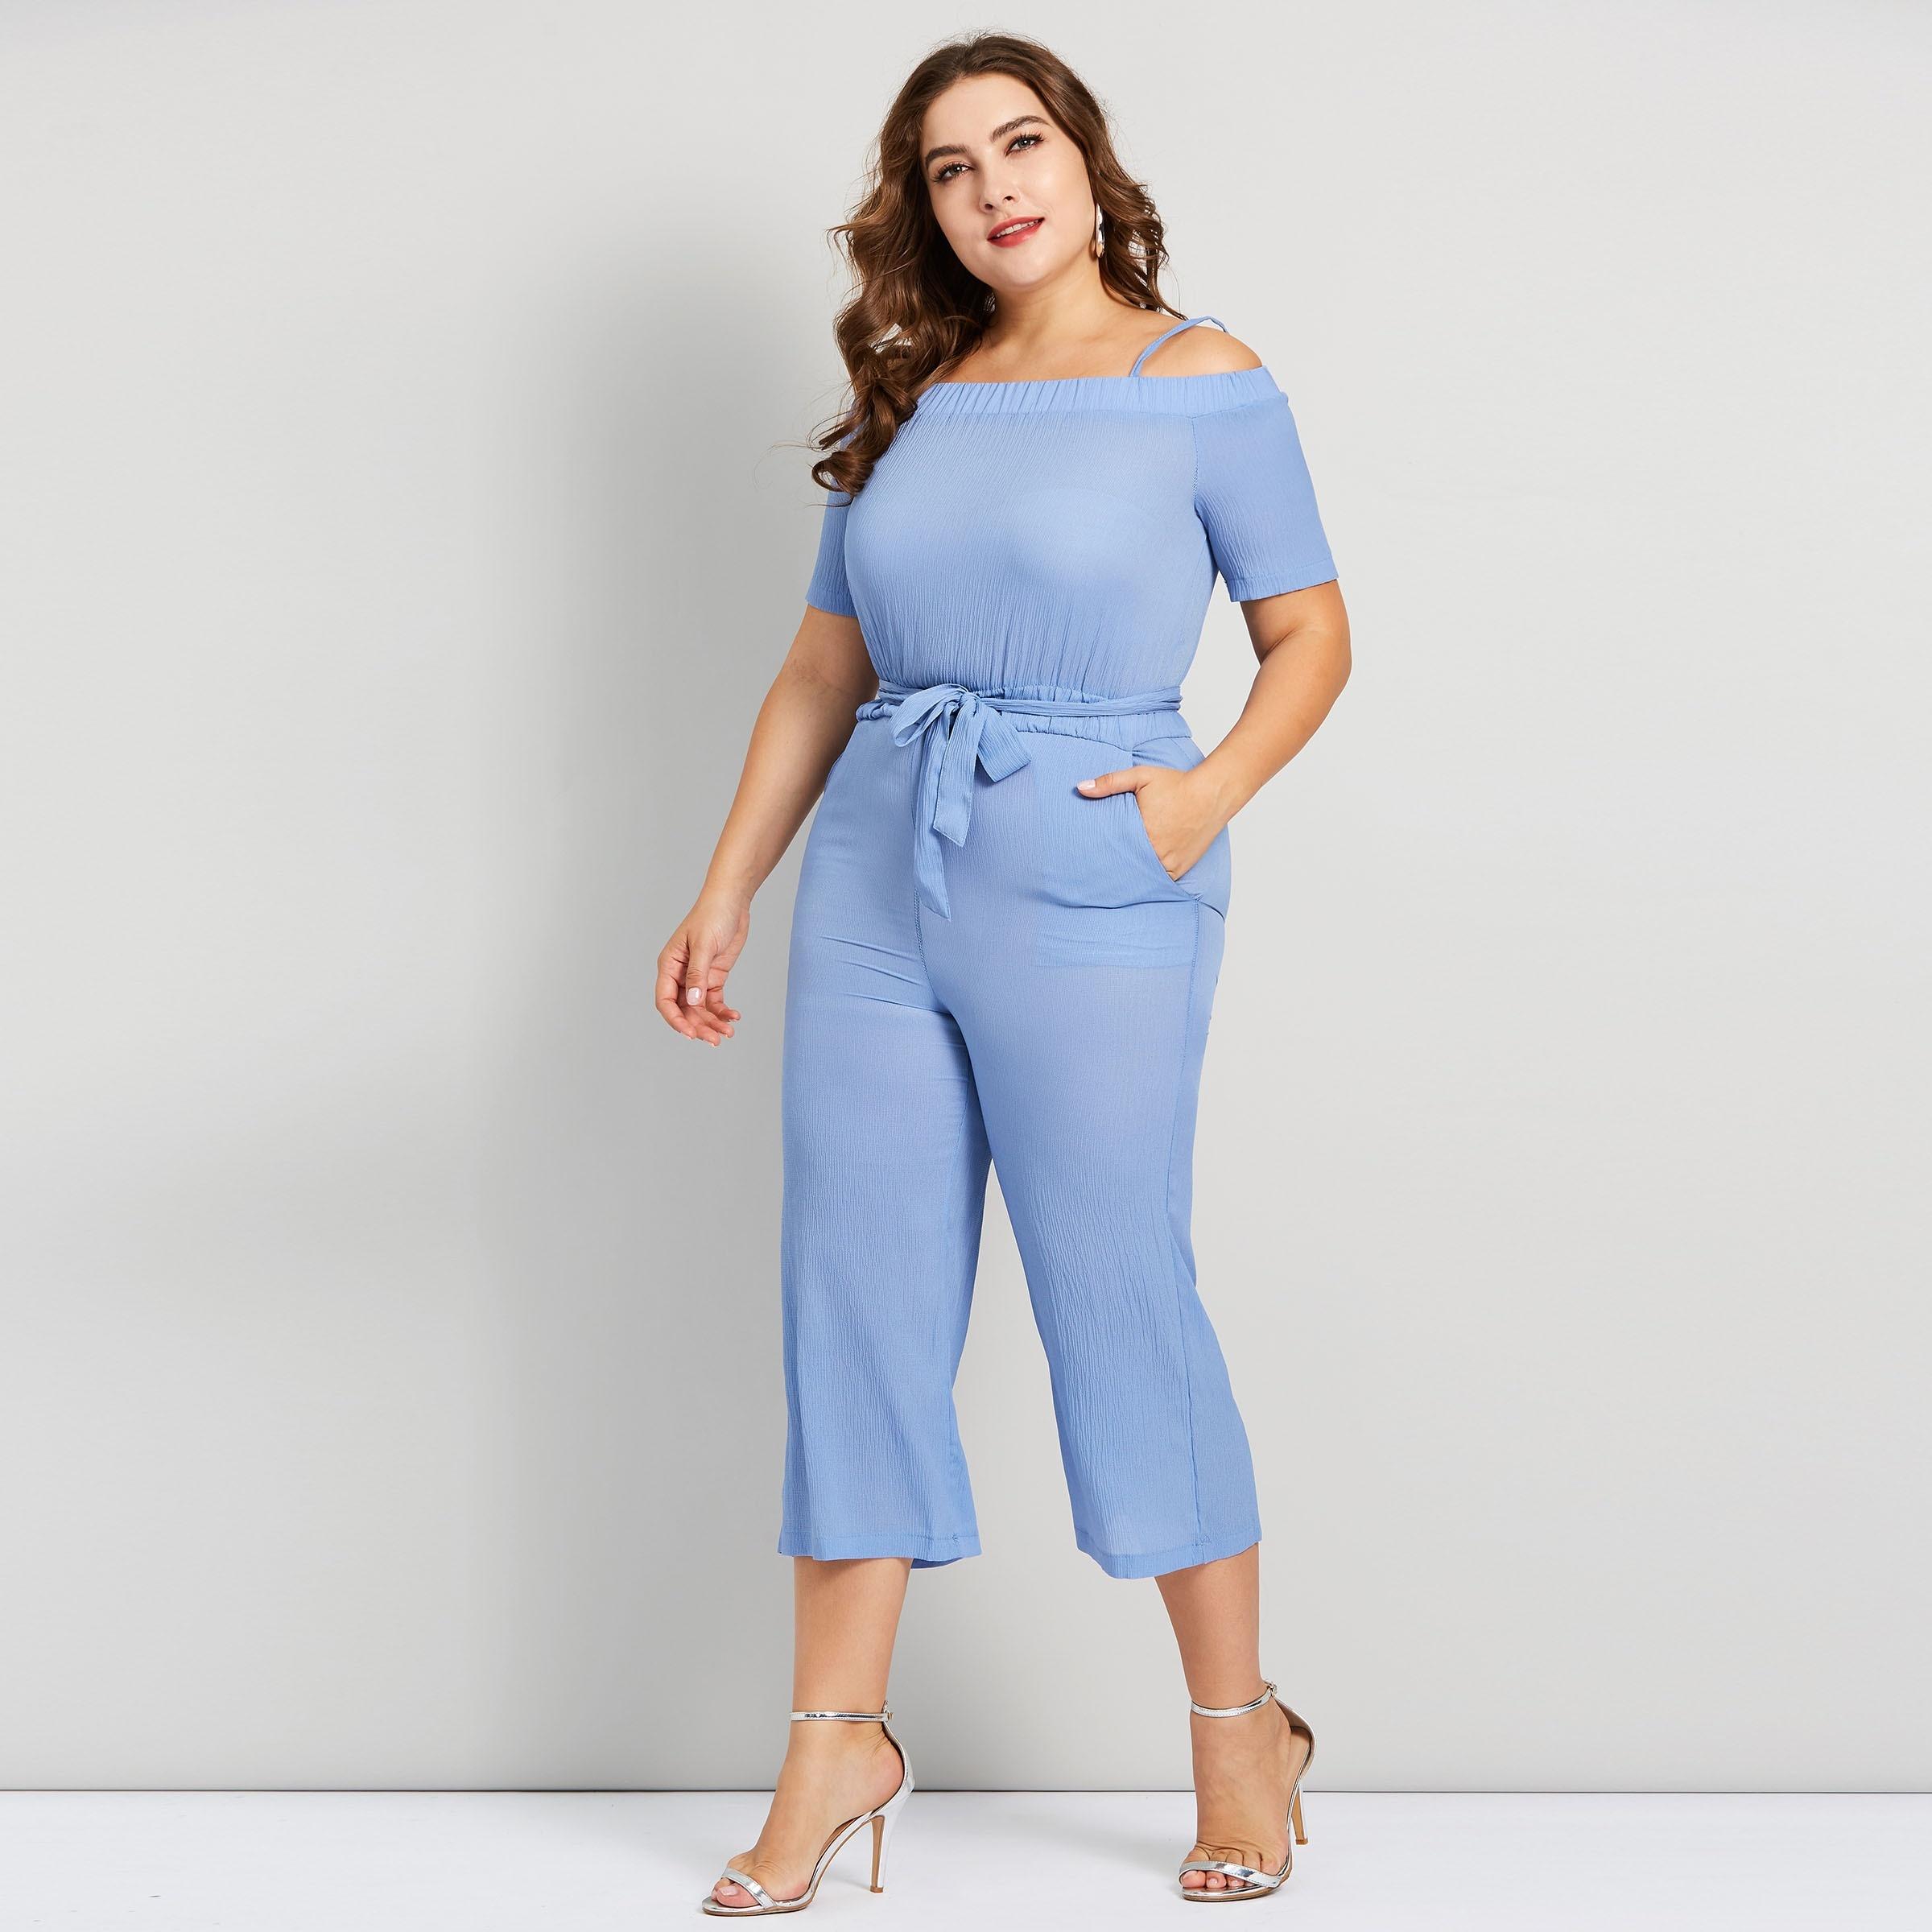 103c919b588 Plusee Plus Size 4XL Jumpsuit Women Lace Up Slim Slash Neck Sexy Blue Sweet  Fashion Casual